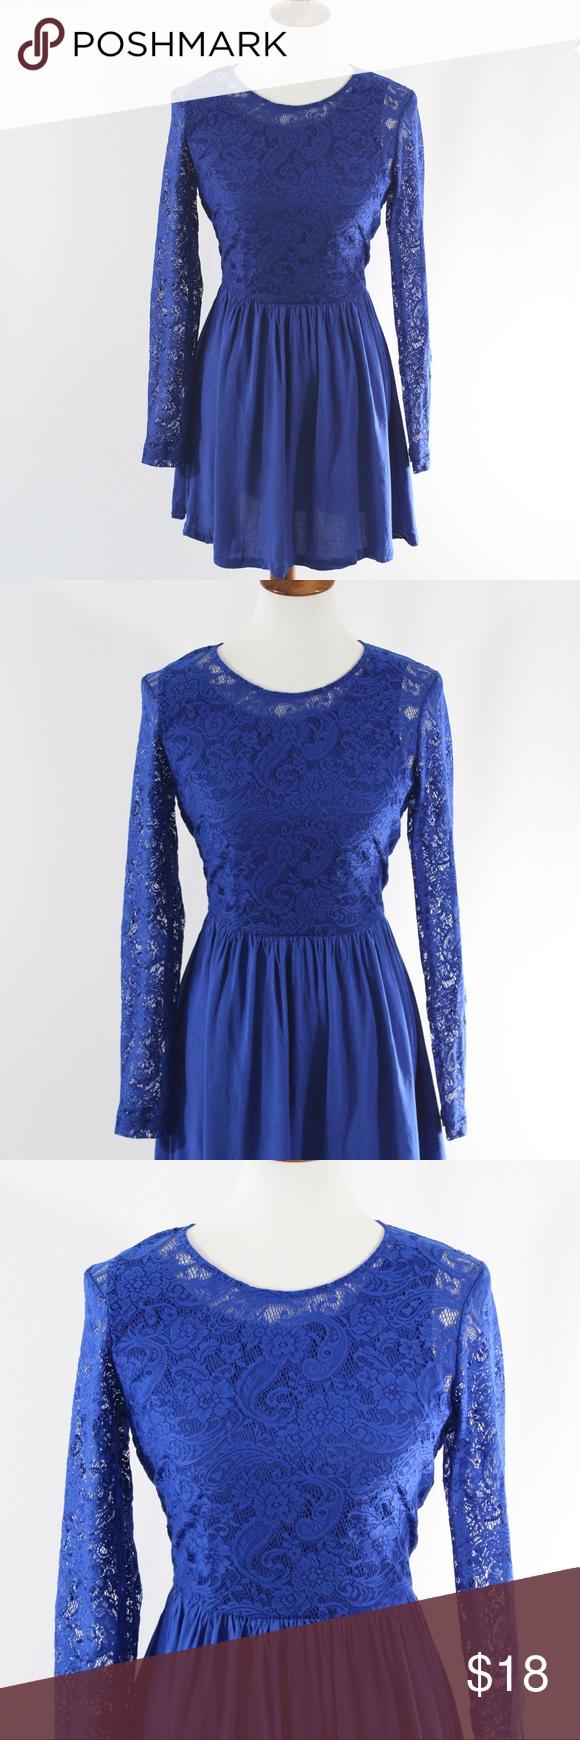 H&m lace dress white  HuM lace dress  My Posh Closet  Pinterest  Lace dress Cobalt